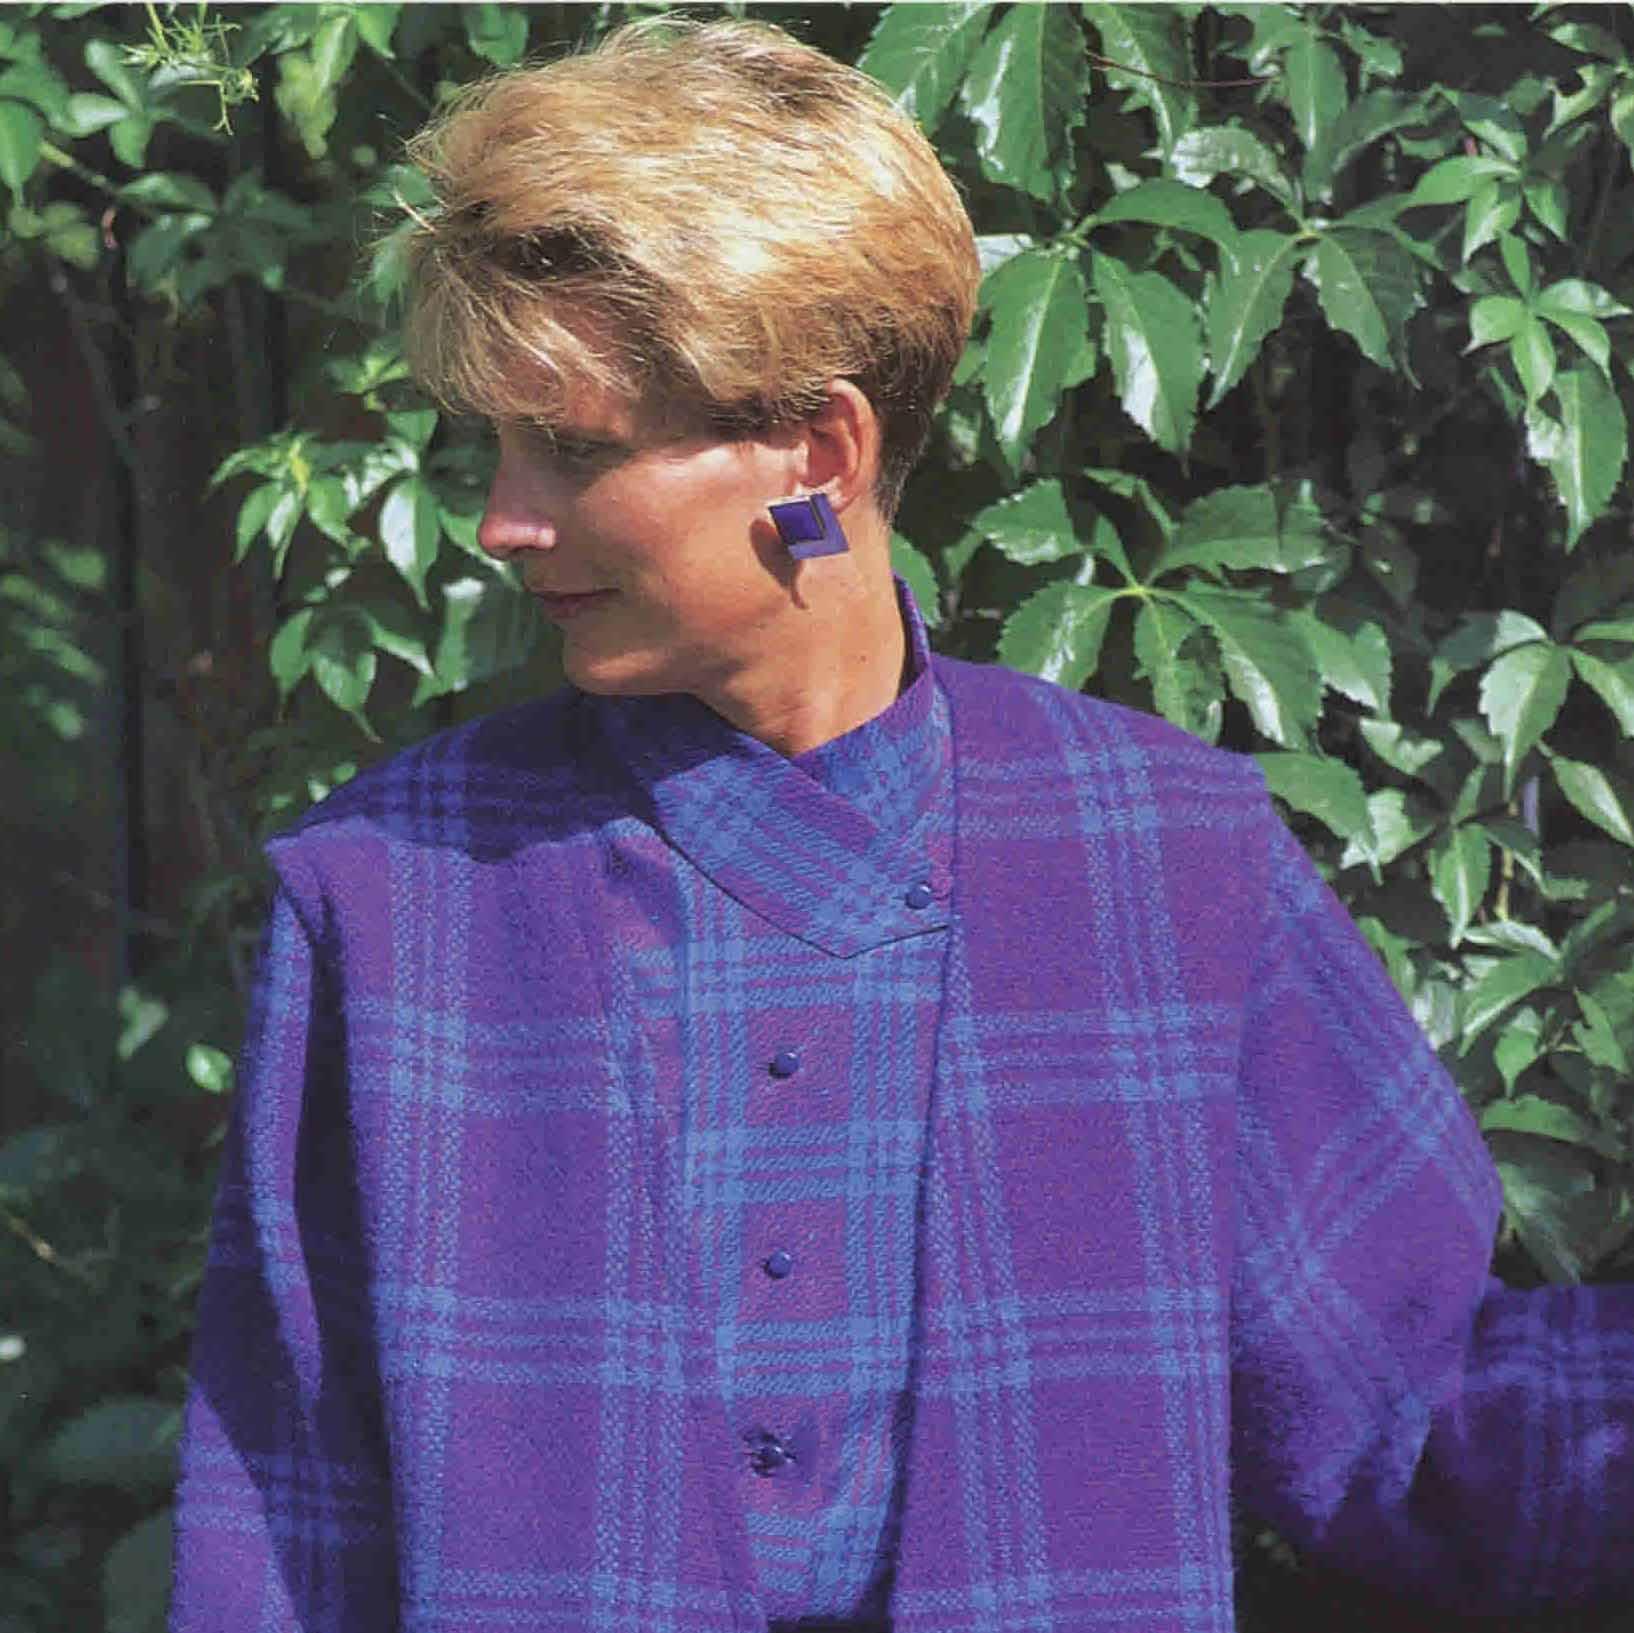 sew handwoven fabric